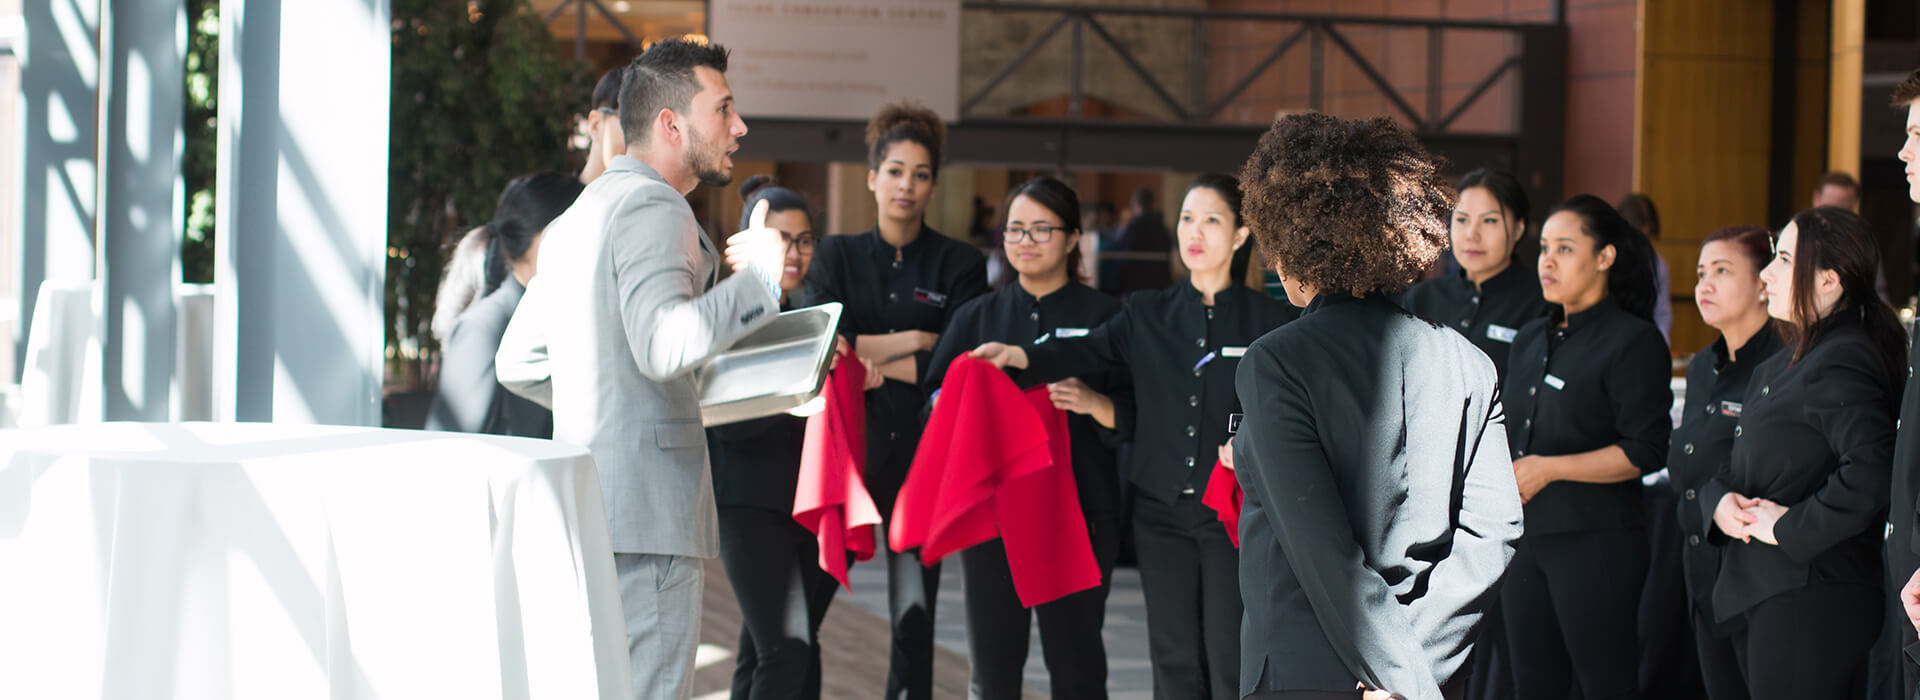 Calgary TELUS Convention Centre b2b brand case study hero image